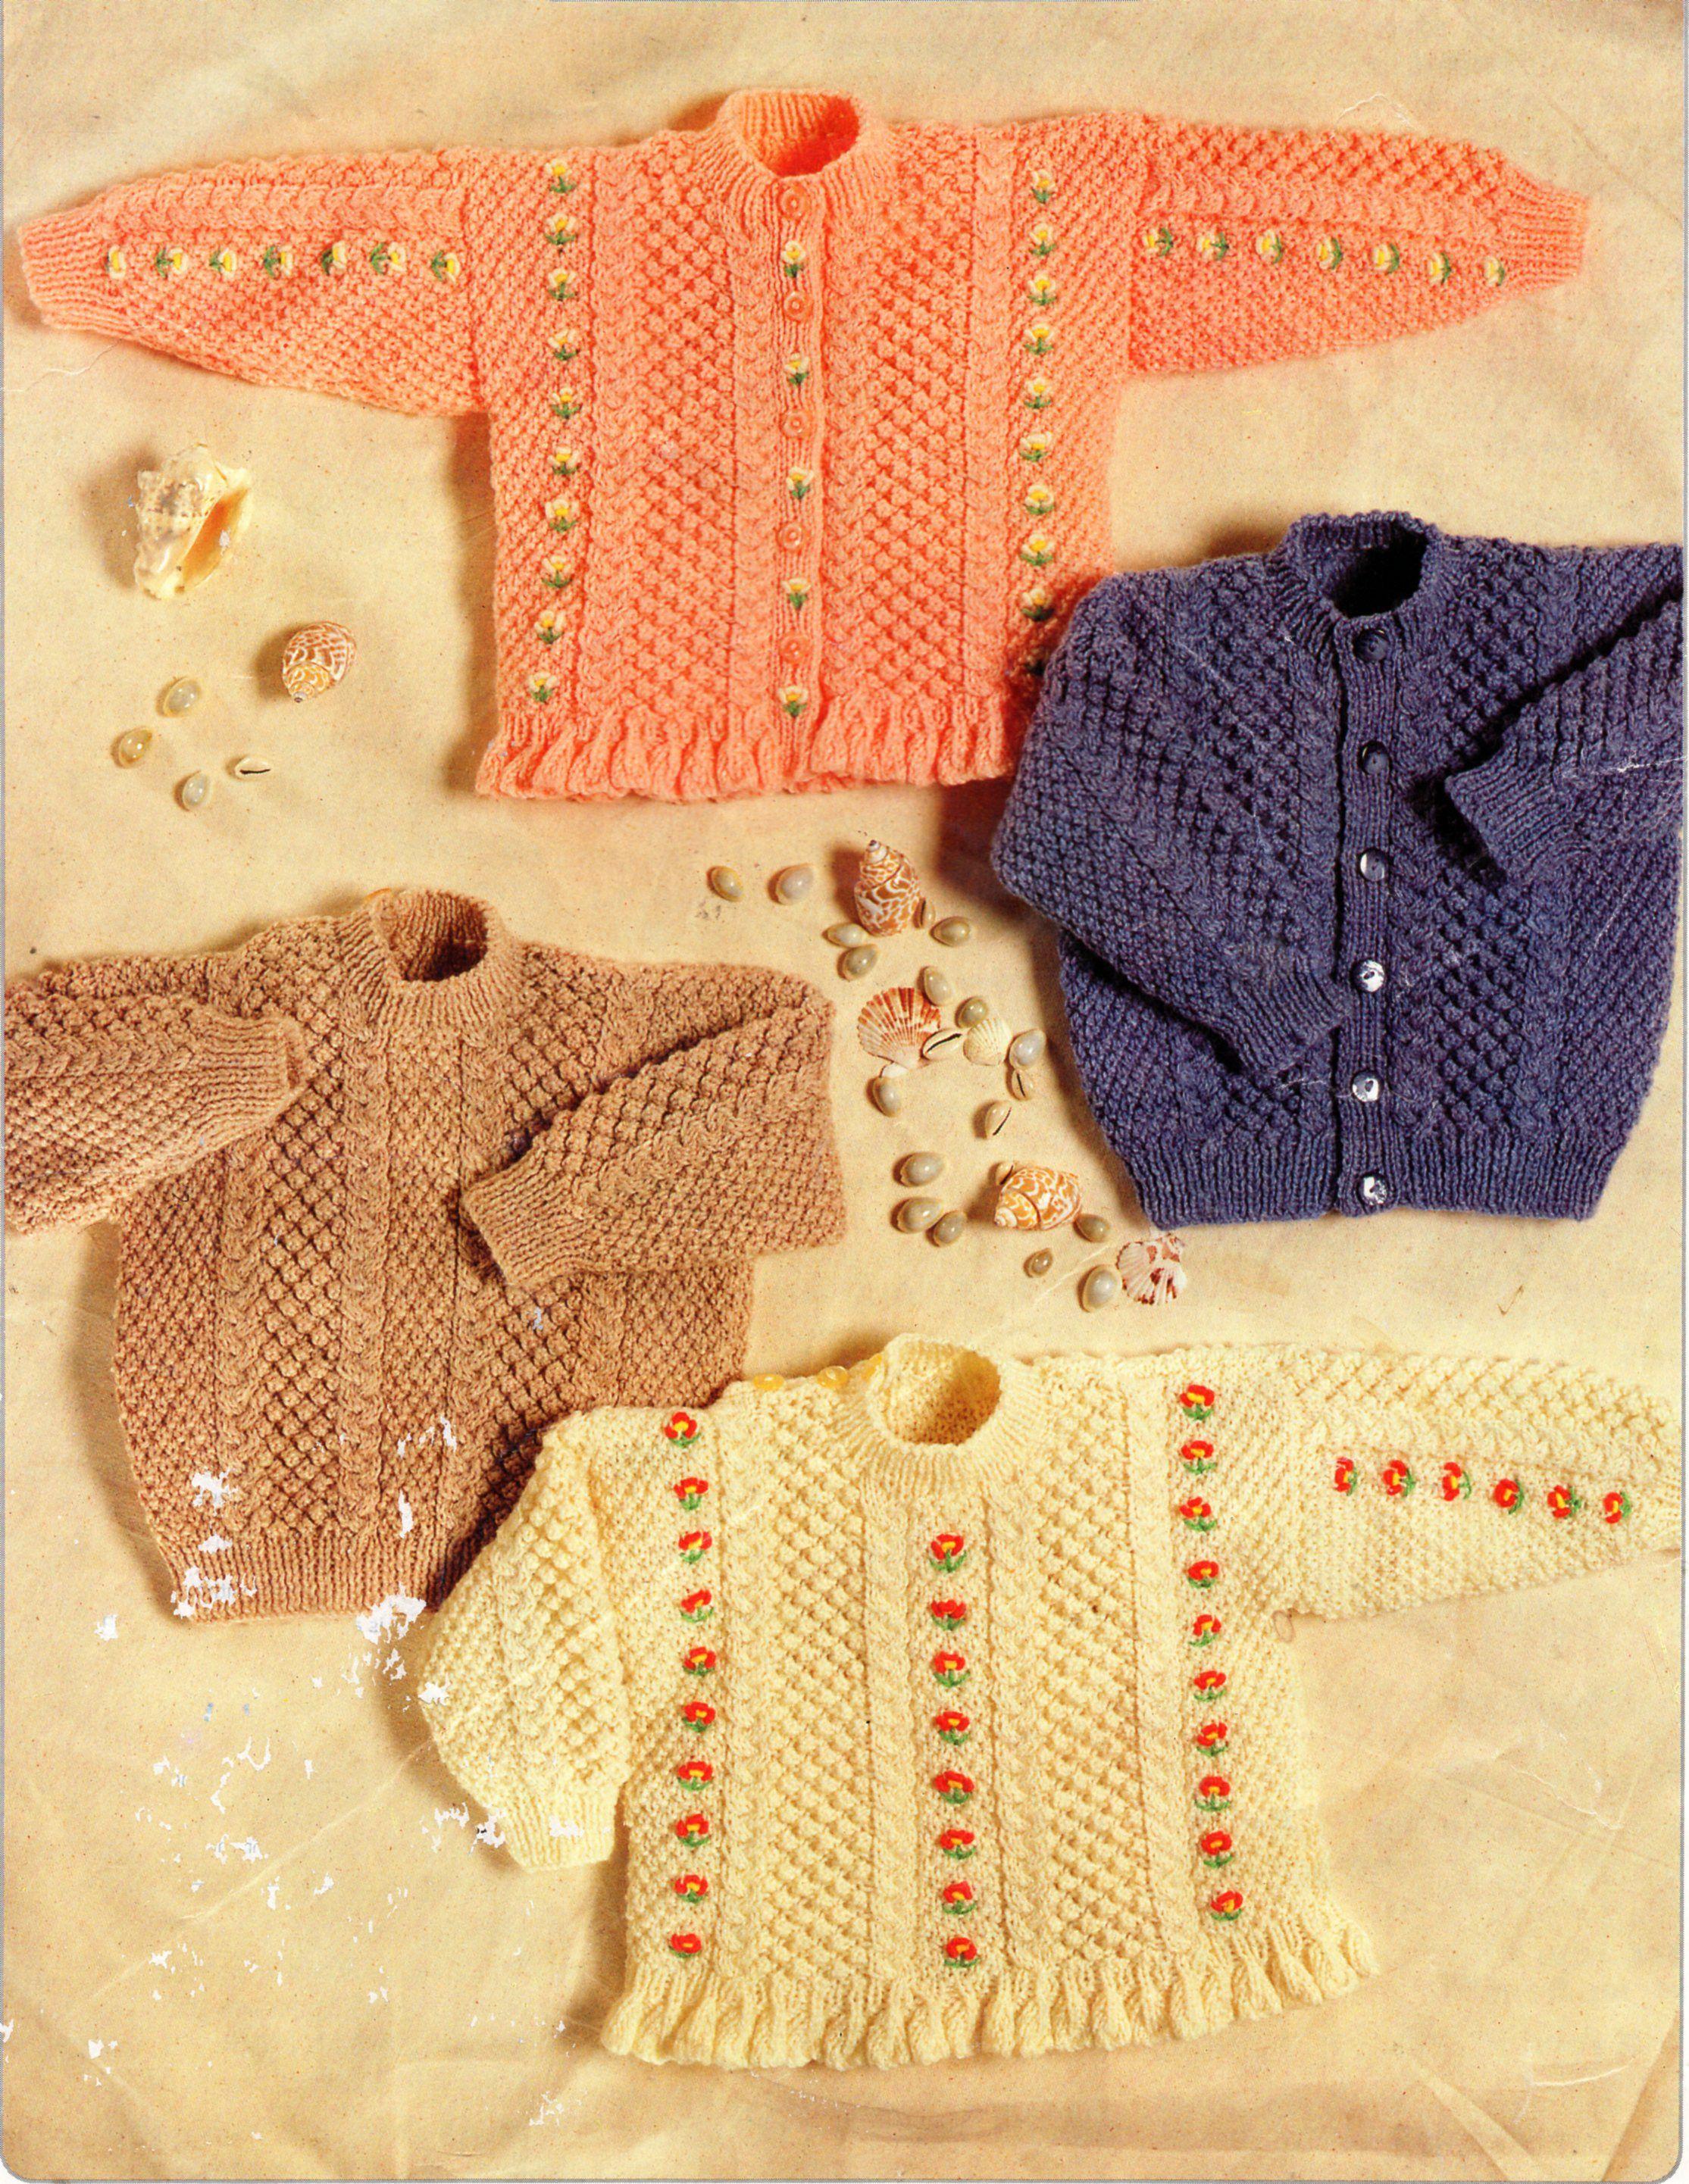 3dd41b331 baby   childs sweaters cardigans knitting pattern pdf girls ...